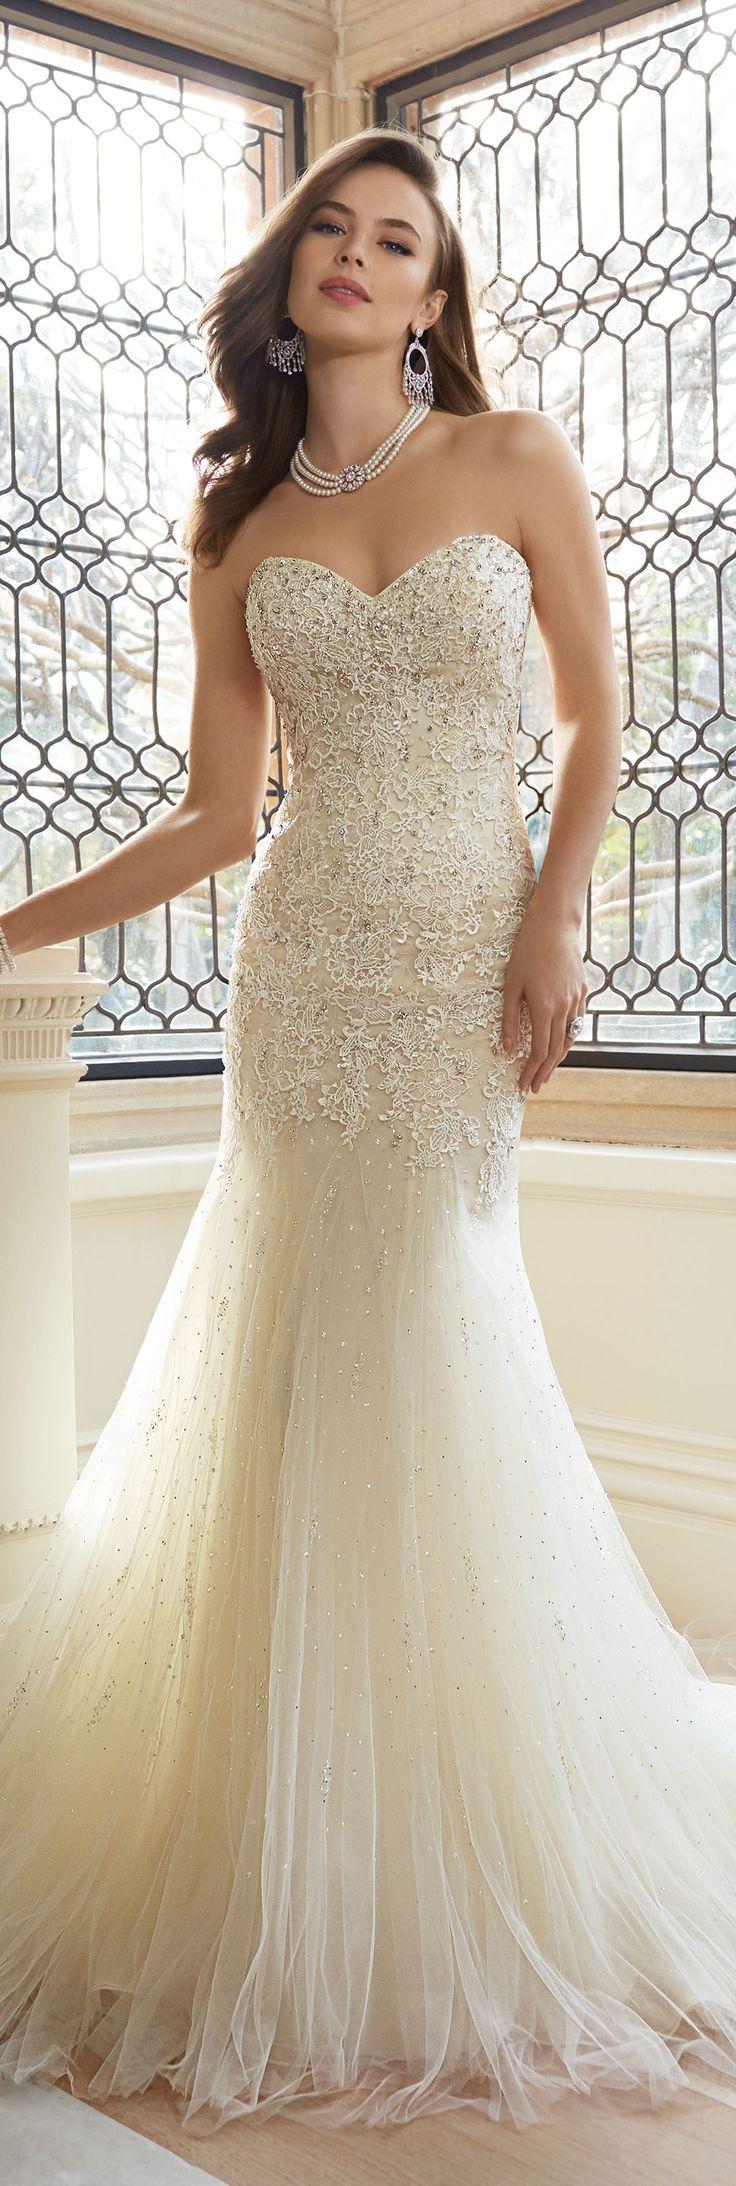 The Sophia Tolli Spring 2016 Wedding Dress Collection - Style No. Y11625 - Amira #laceweddingdress